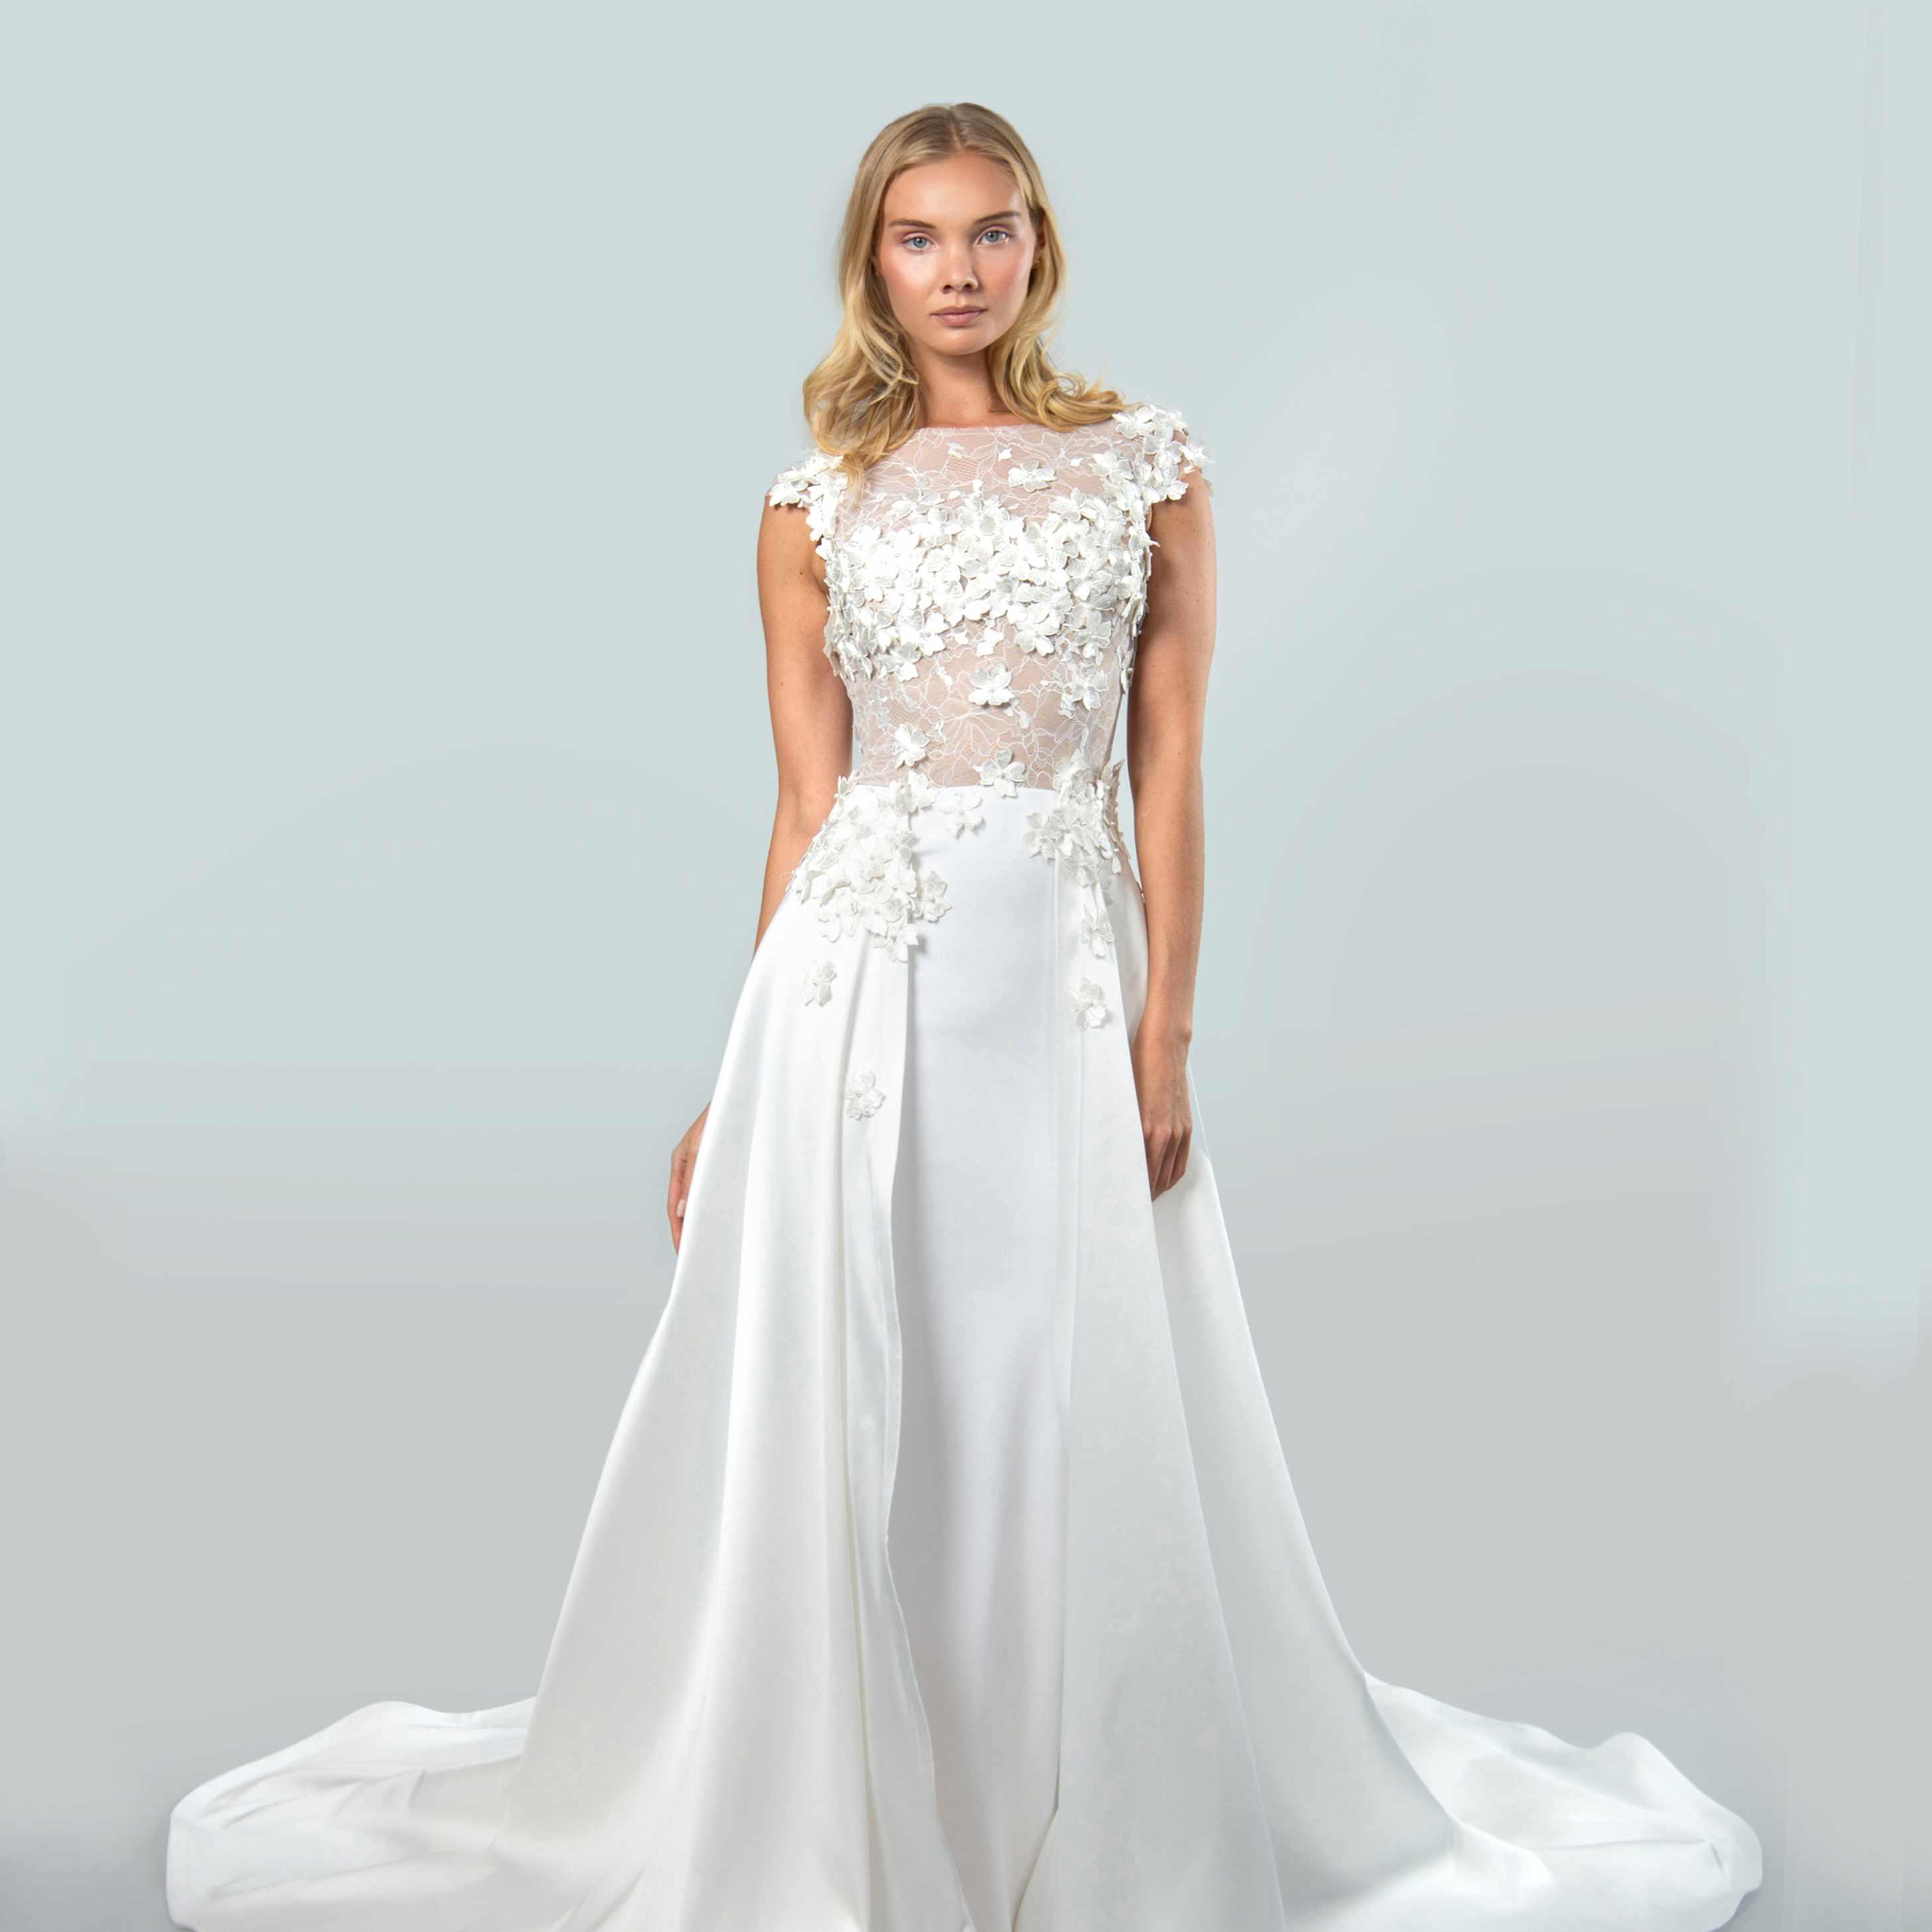 Model in bateau neckline with cap sleeves wedding dress